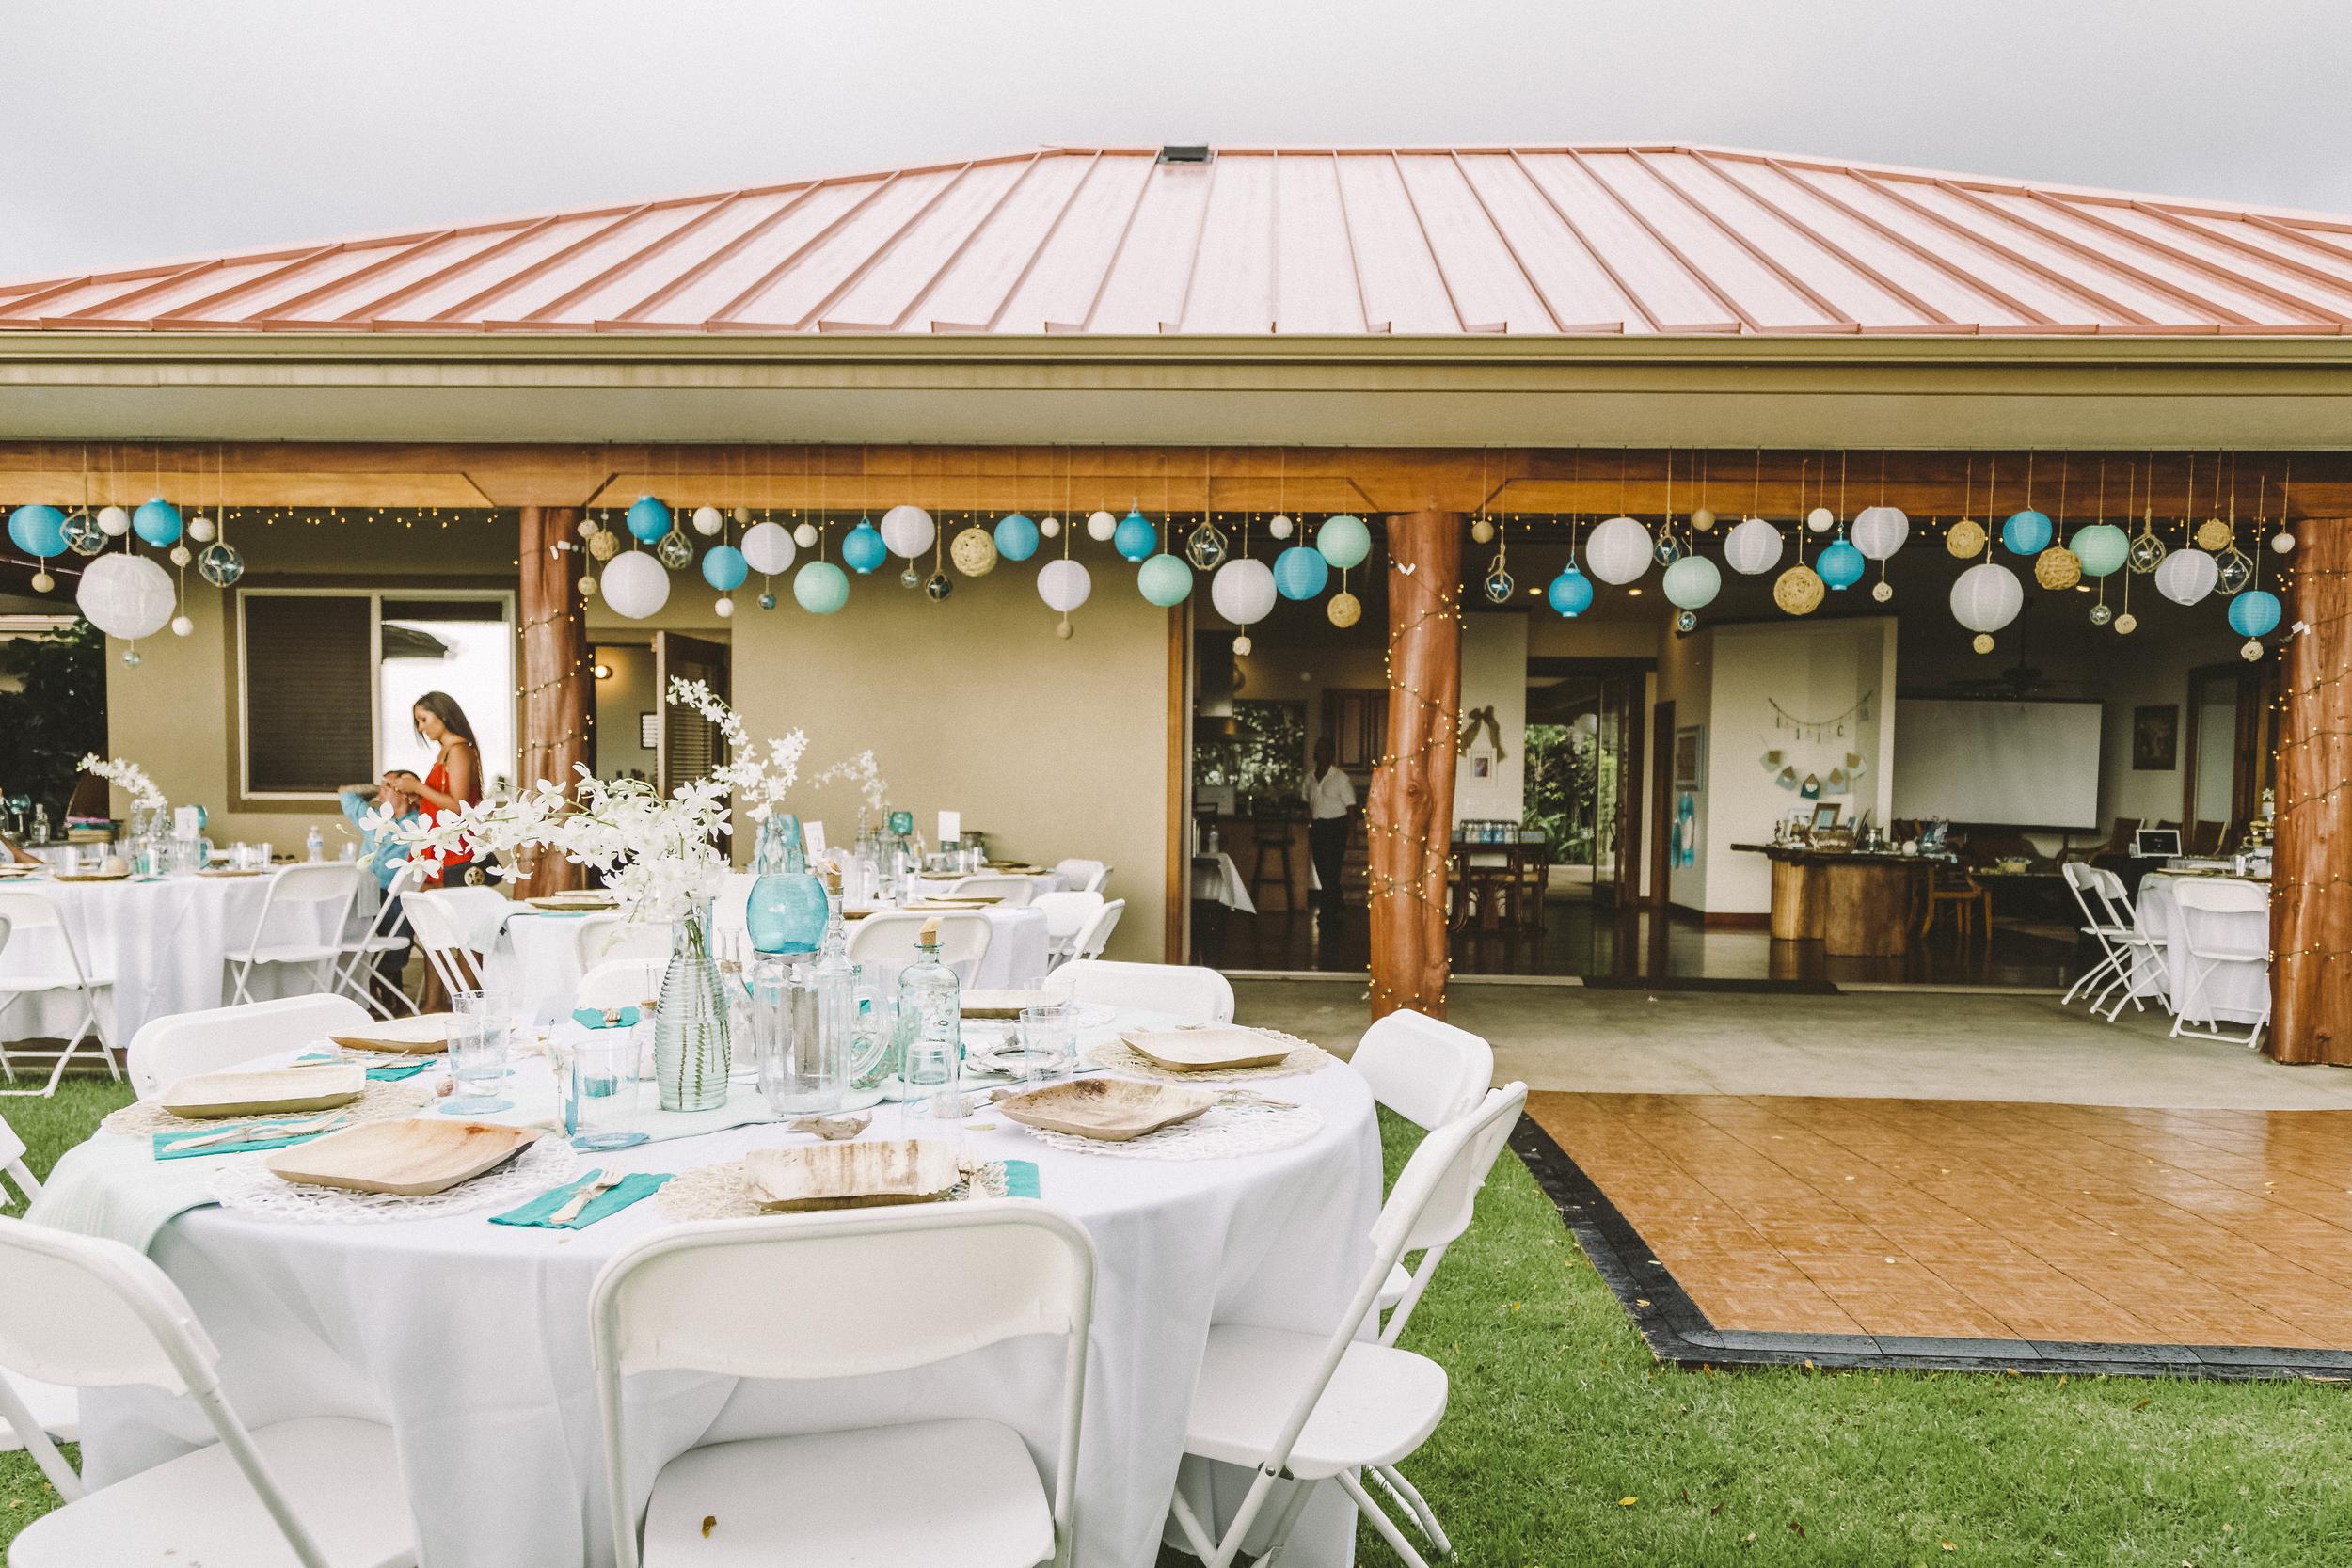 angie-diaz-photography-hawaii-wedding-photographer-kelli-jay-99.jpg